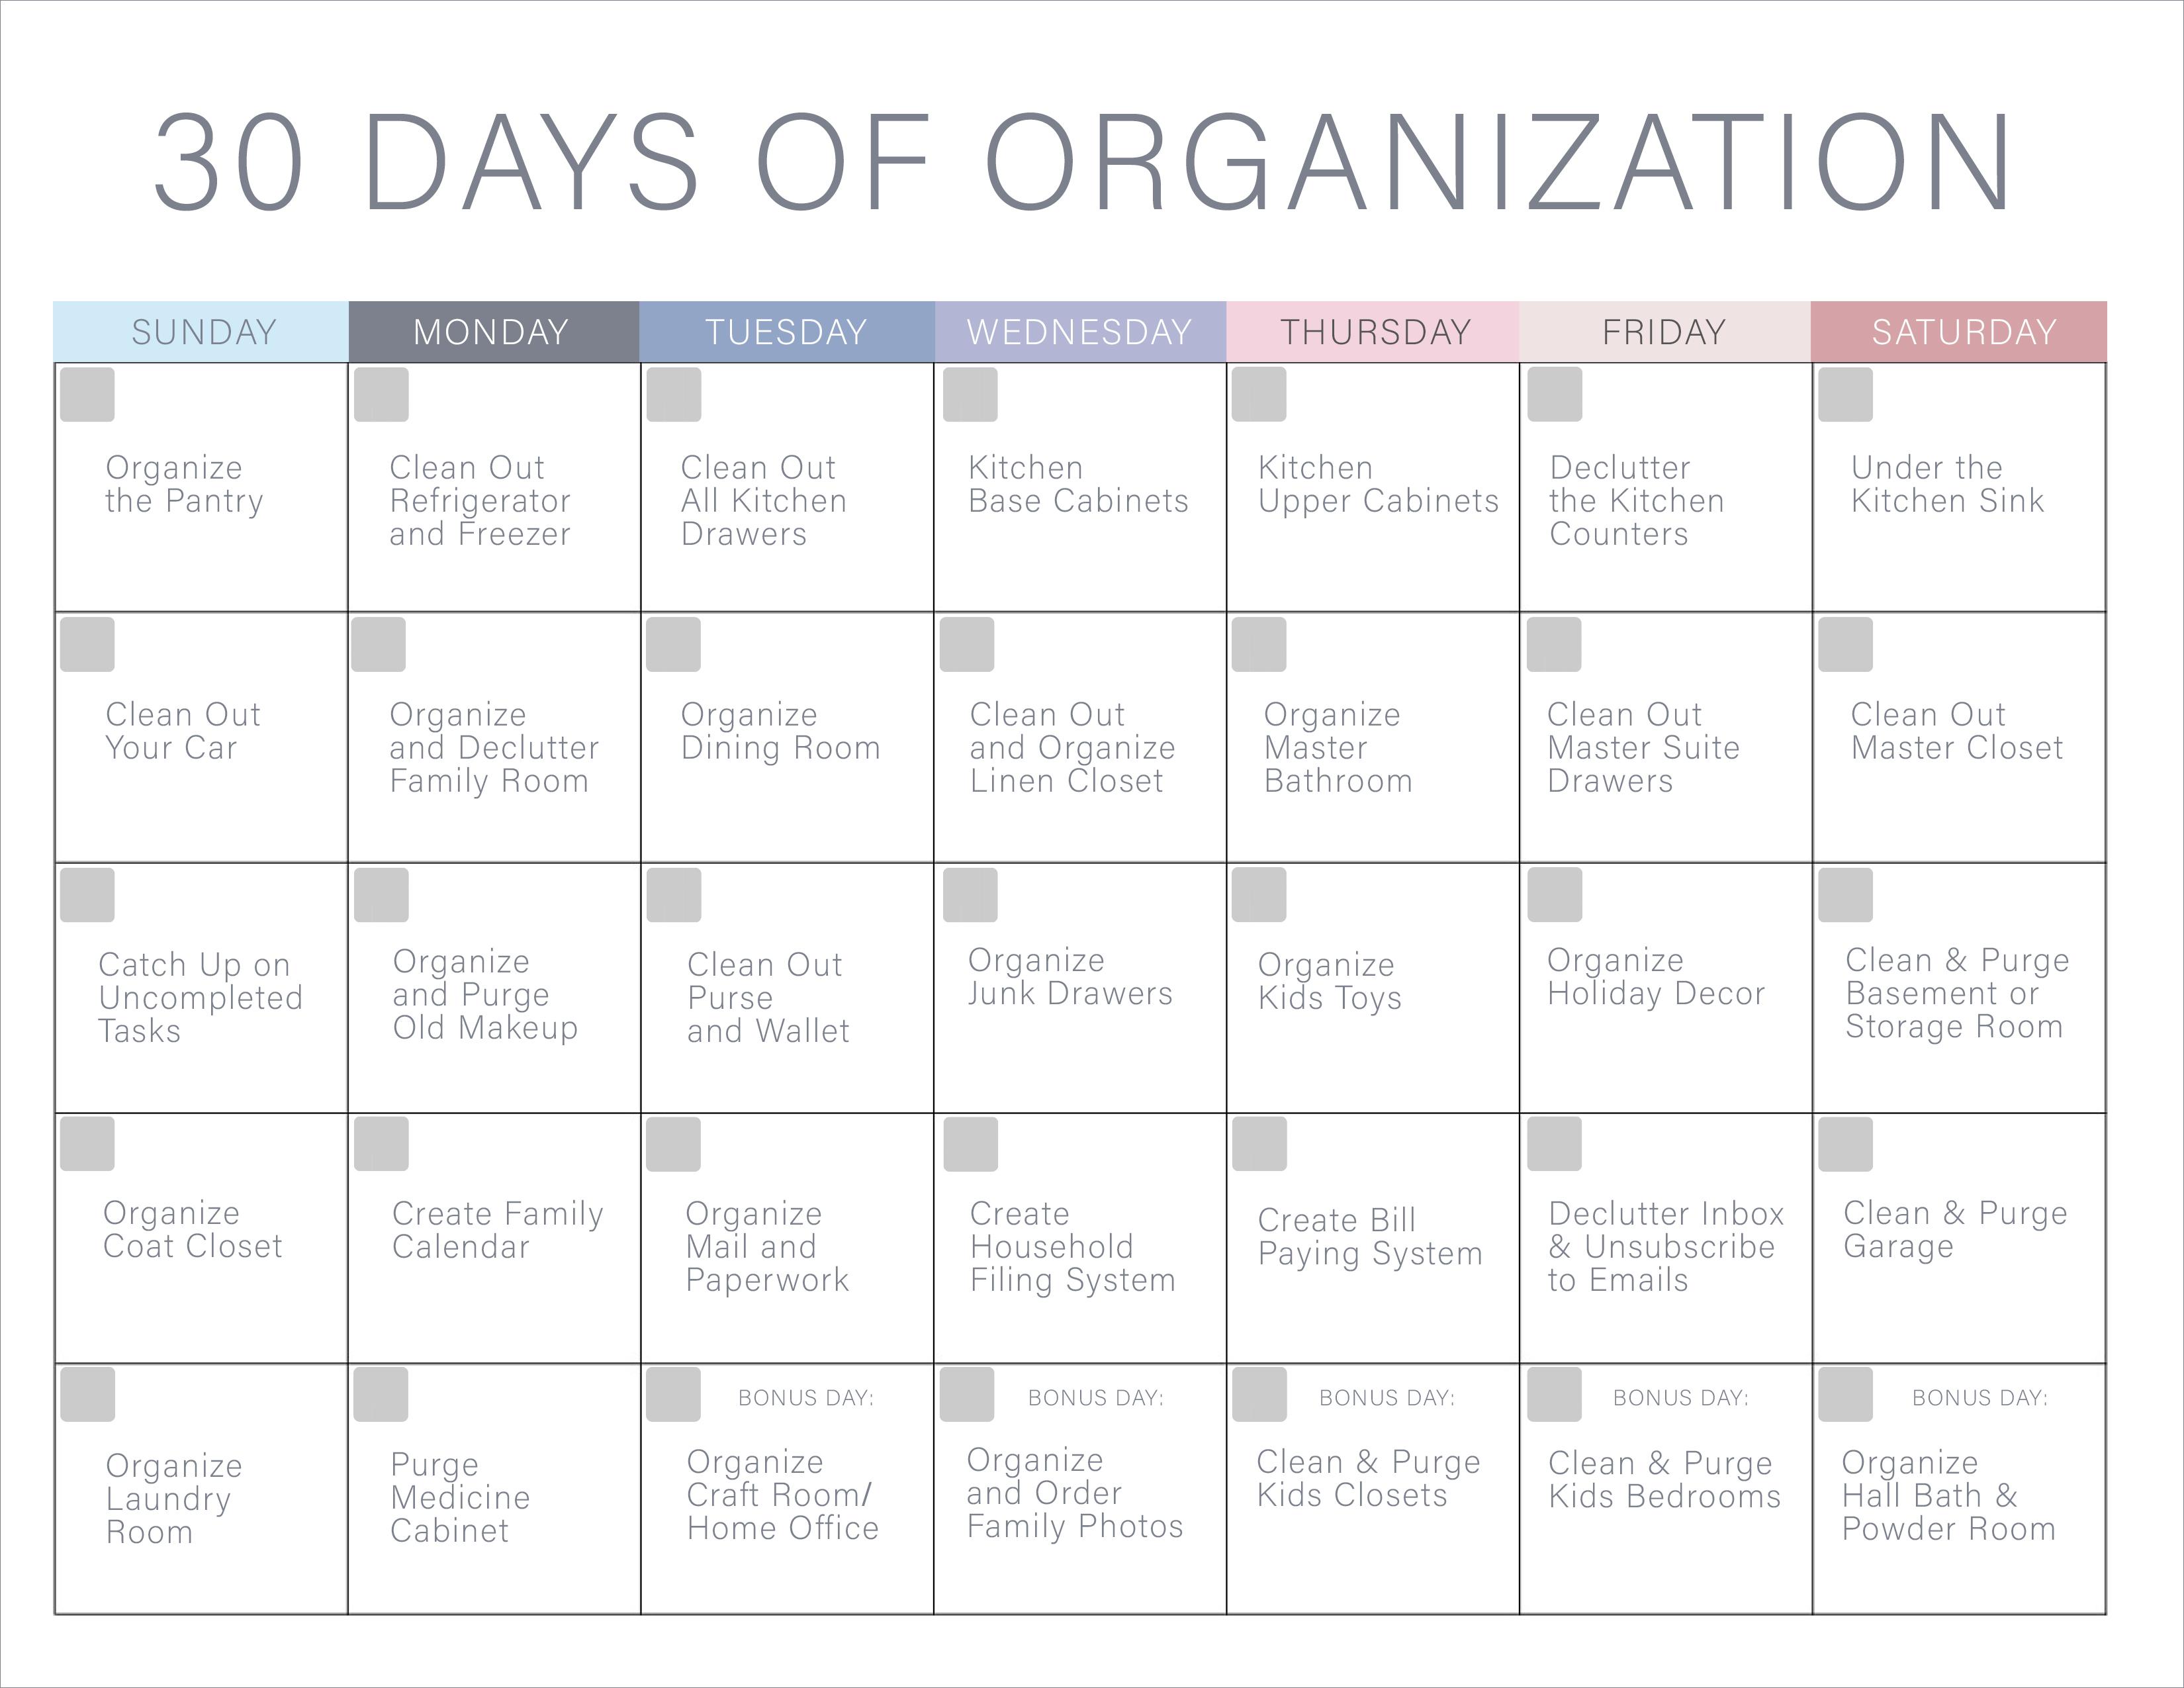 30 Days Of Organization Challenge  Declutter Your Home! regarding 30 Day Declutter Calendar